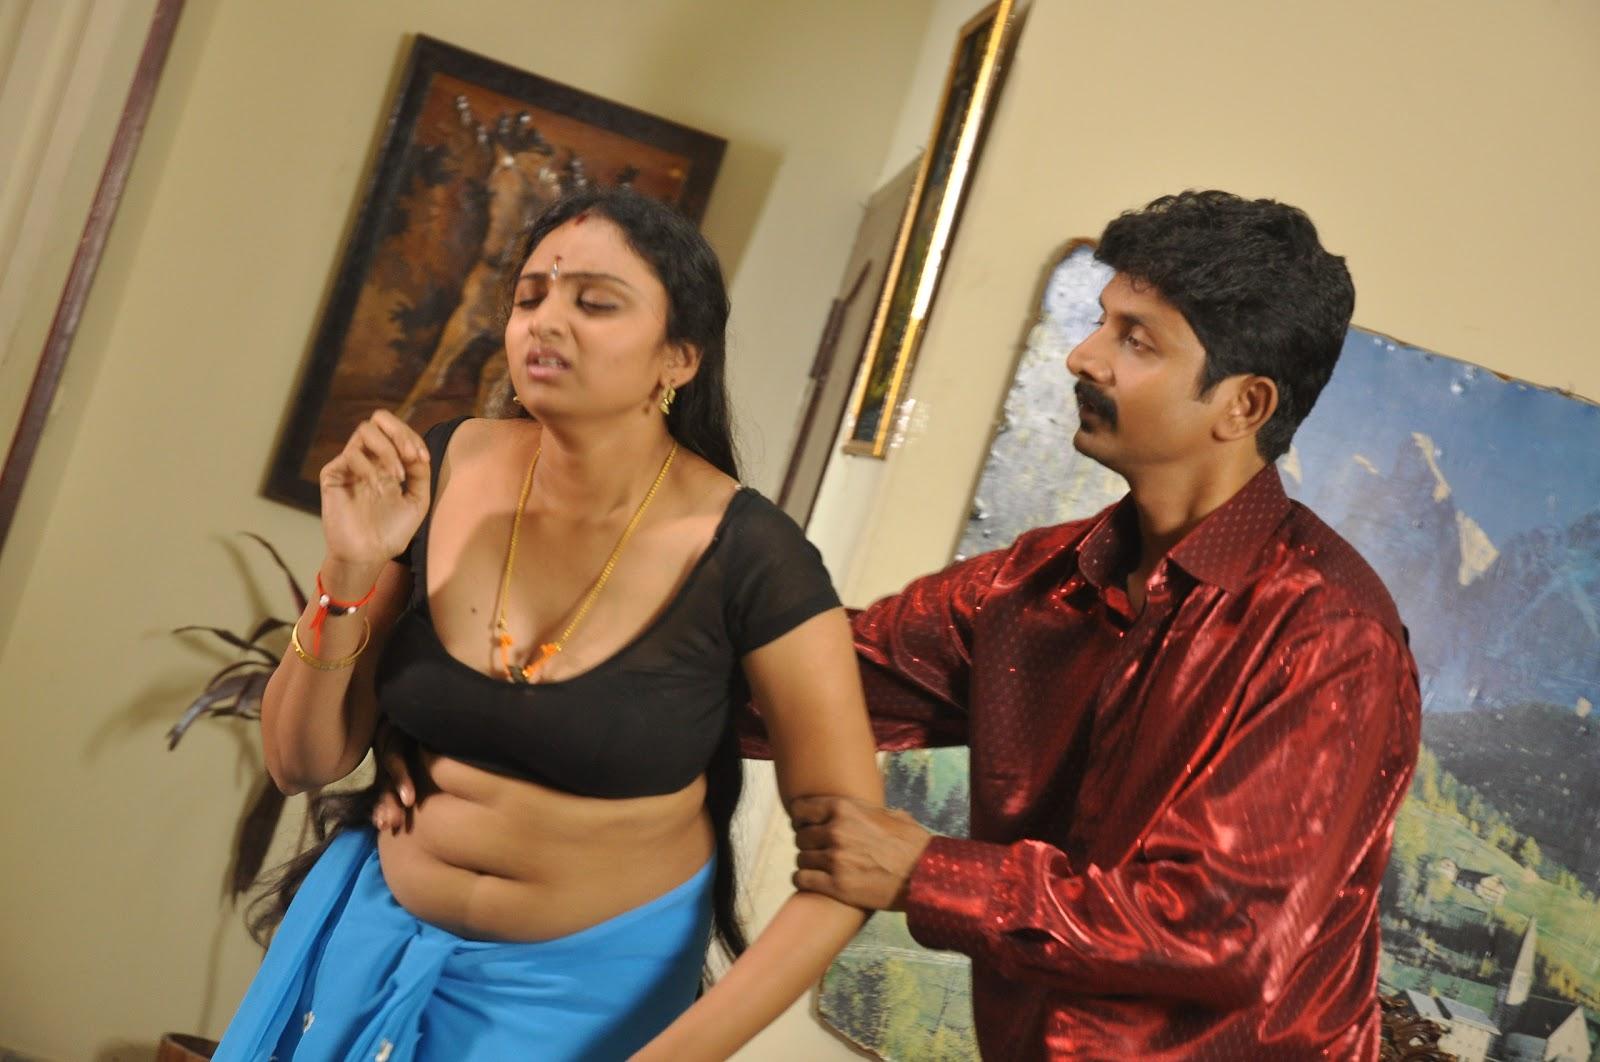 Naked bengali full length movie, hotcore chinese girls